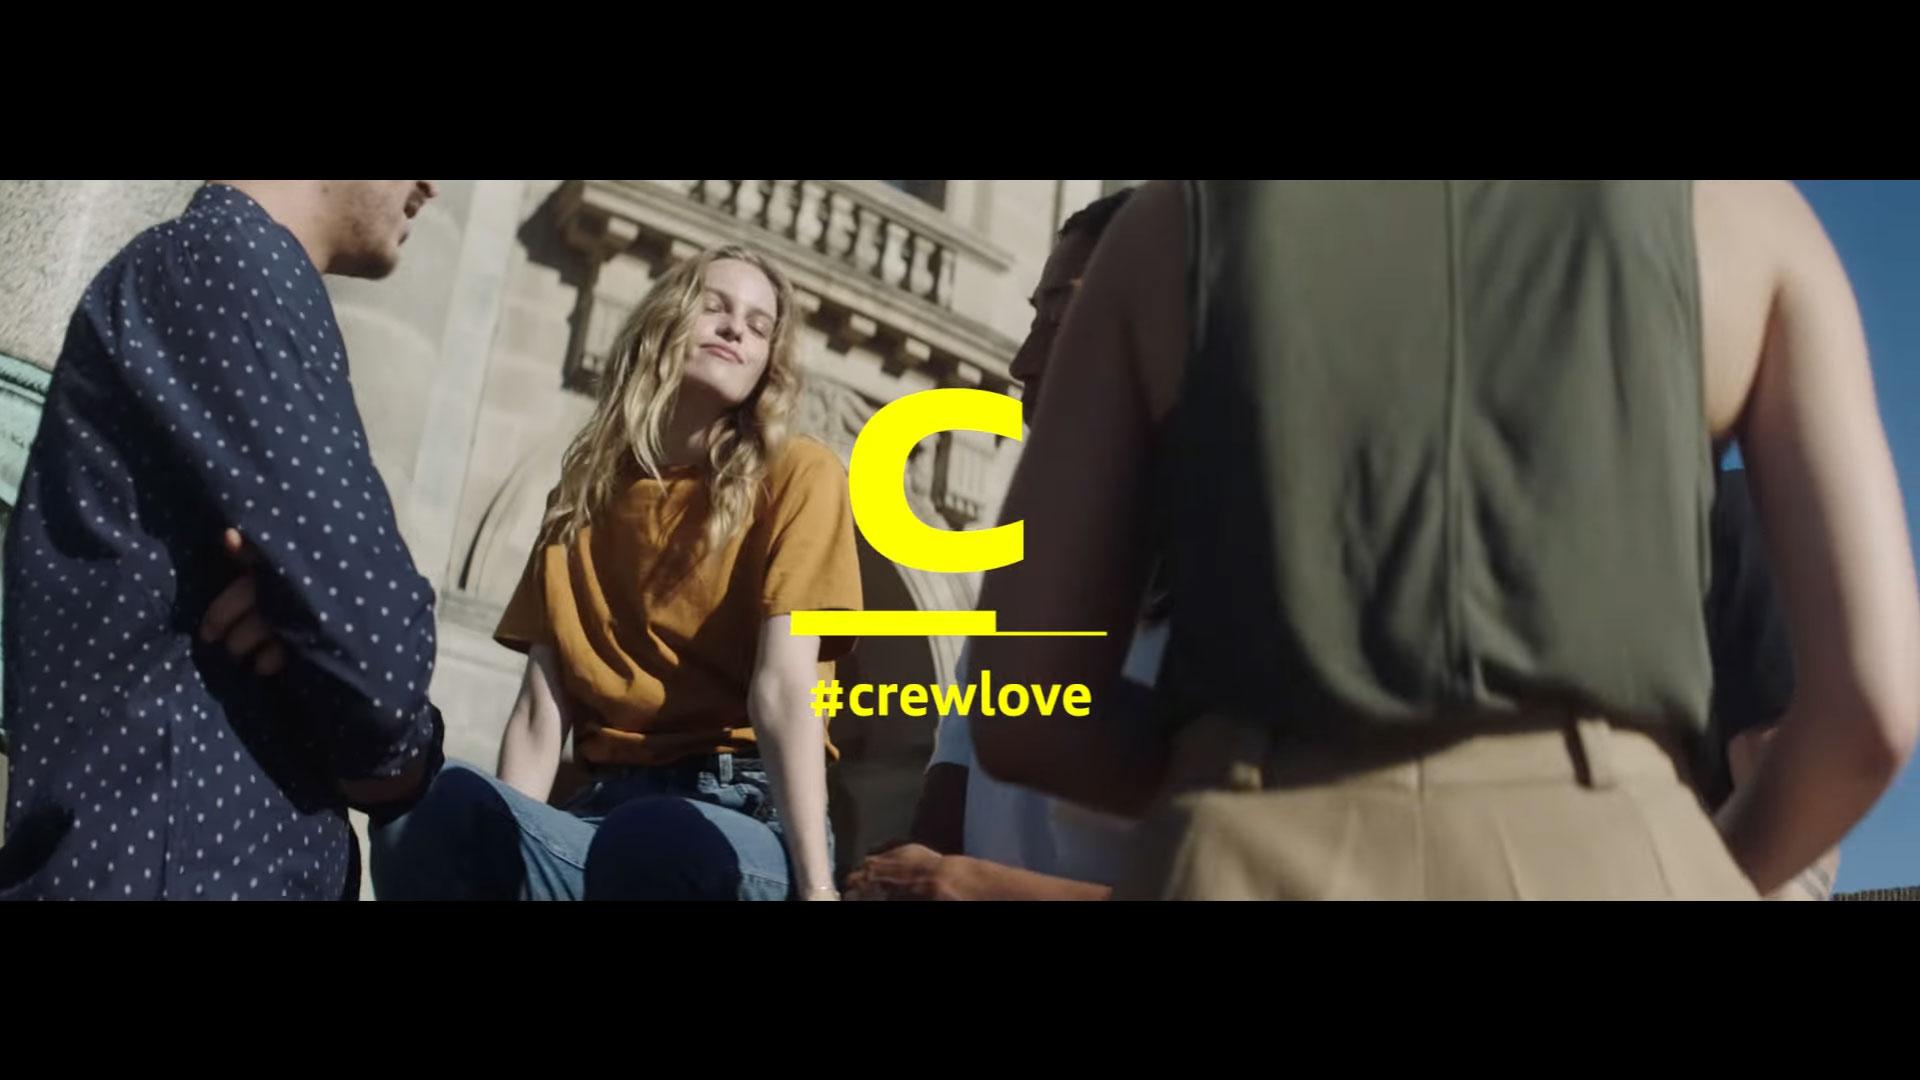 crewlove